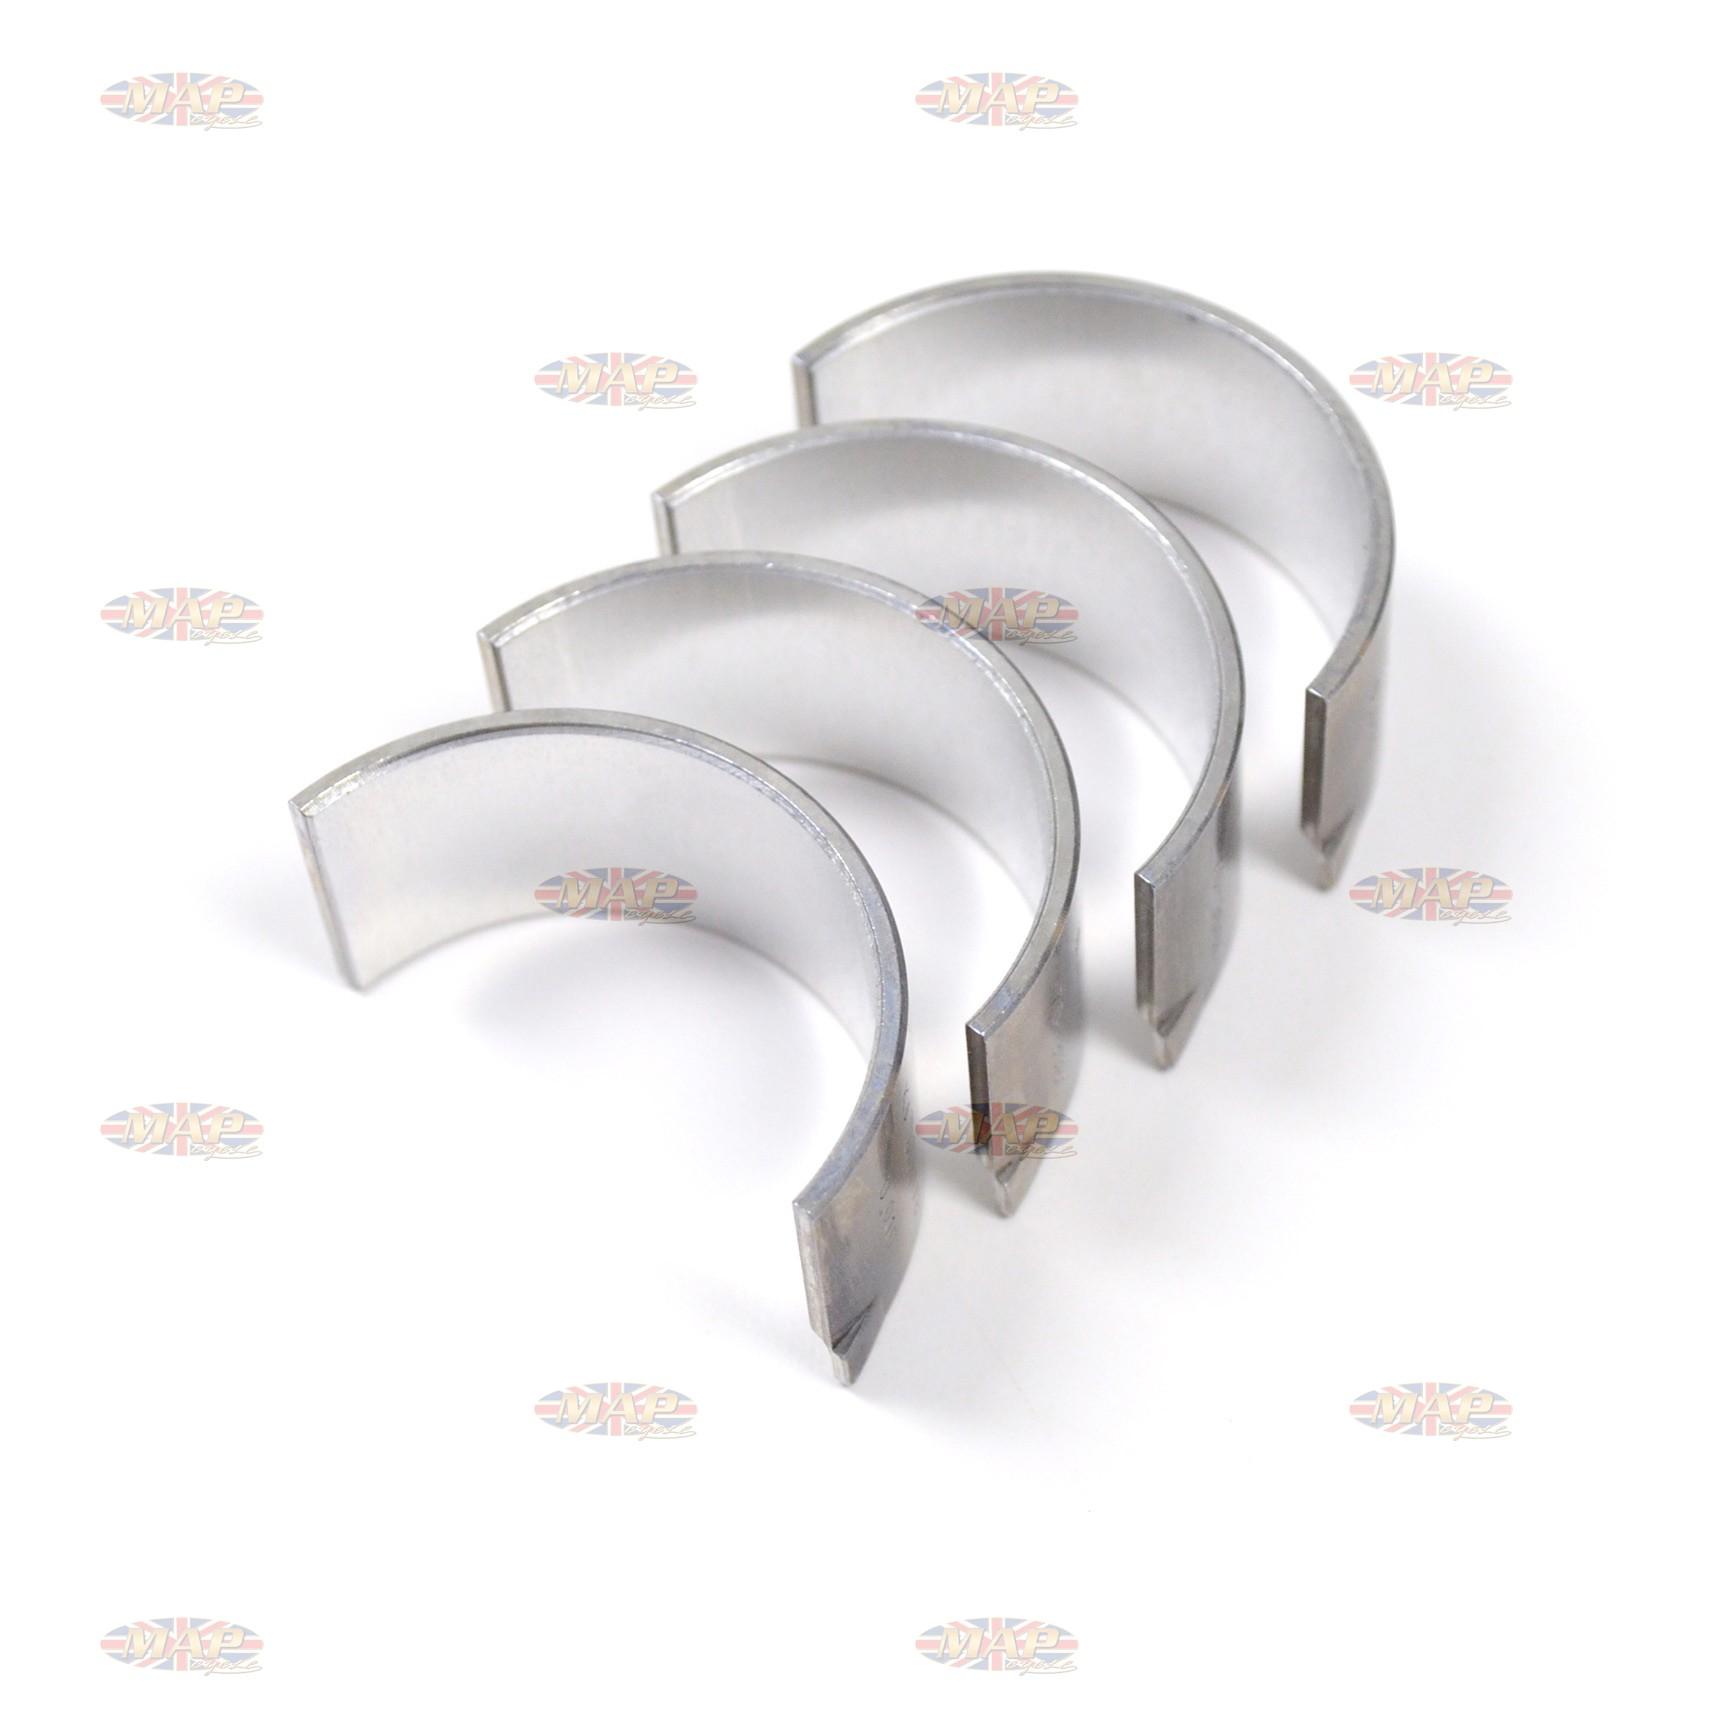 ROD BEARING/ TRI 650-750 II STD B2026M/E